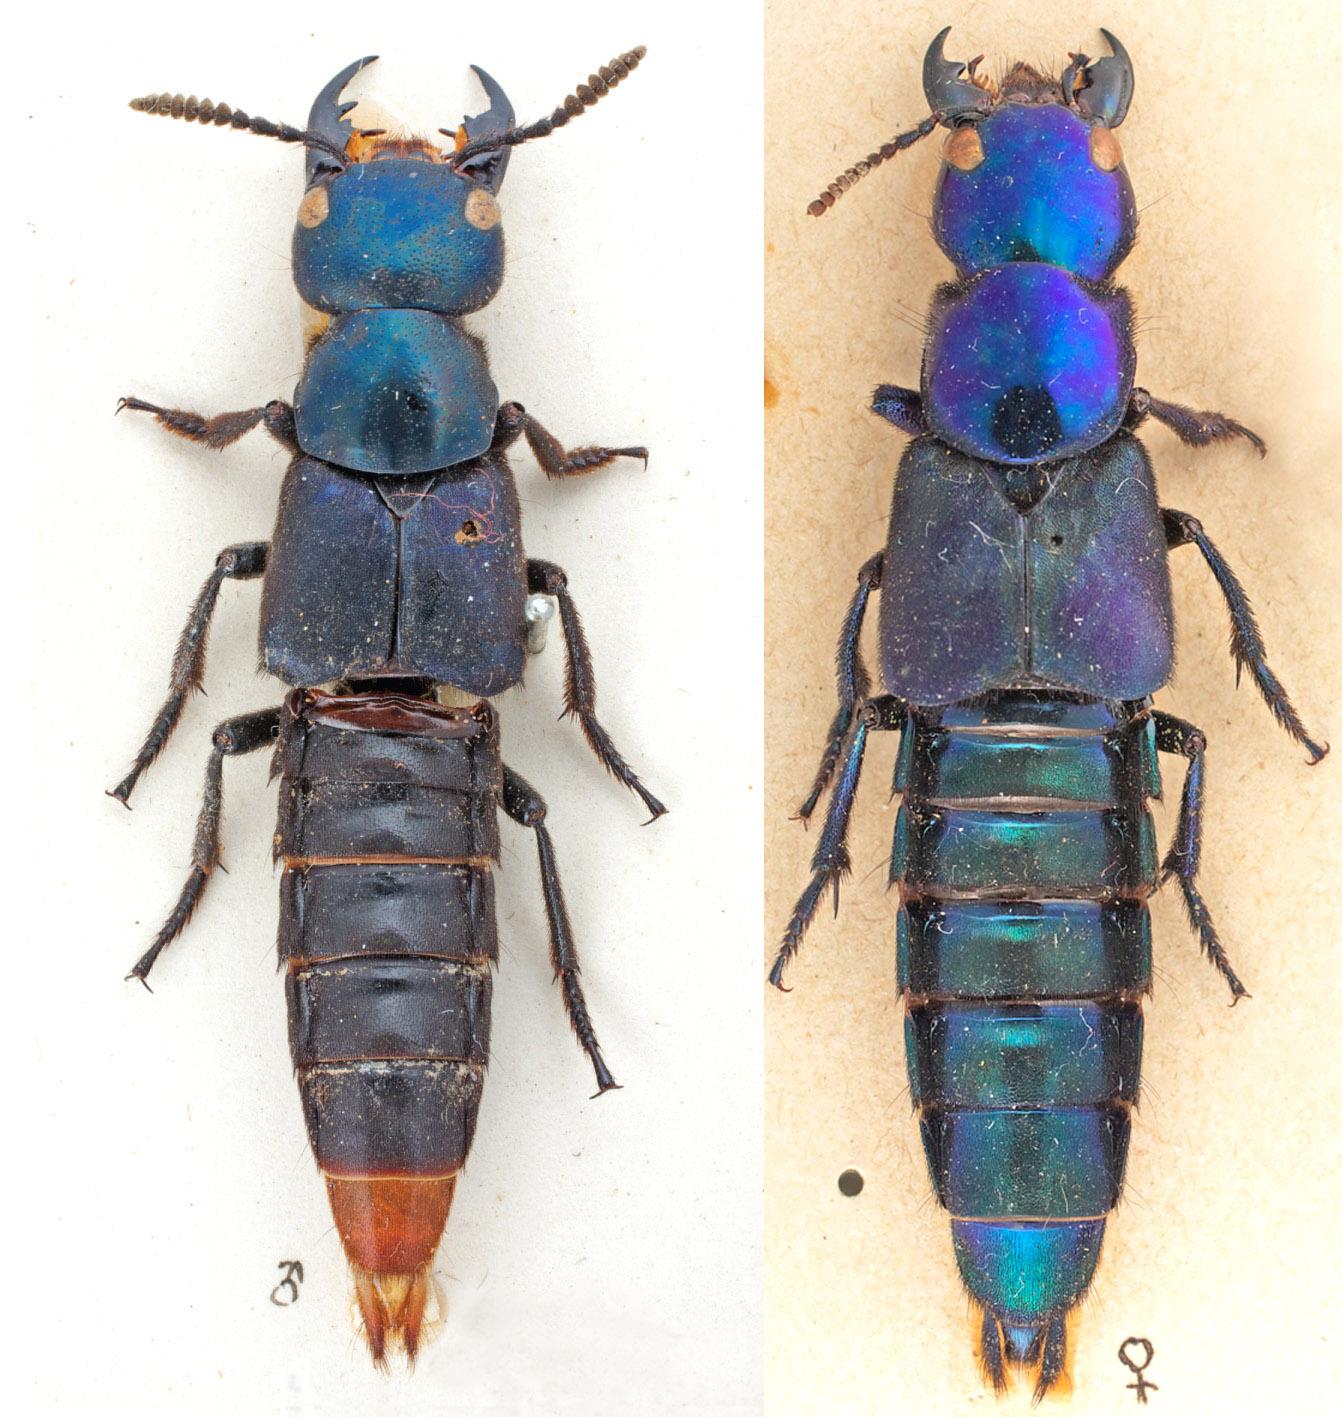 triacrus-dilatus_trigonopselaphus-diplopegus.jpg